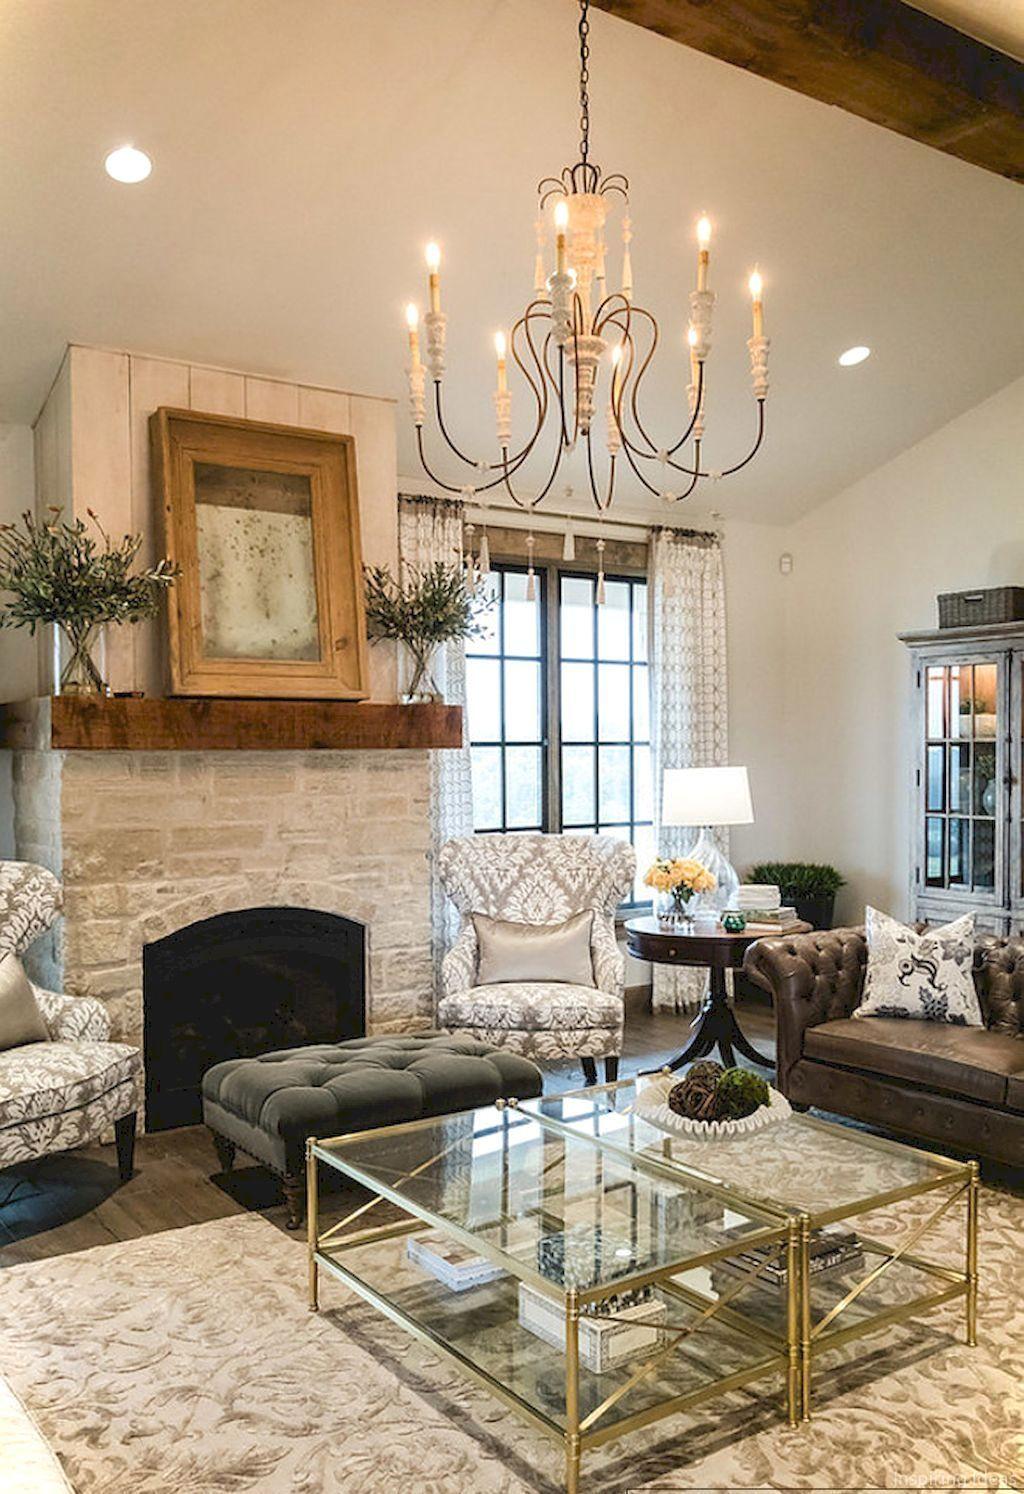 Awesome interesting modern farmhouse living room ideas https lovelyving also of the best tips to make things last longer share your craft rh pinterest